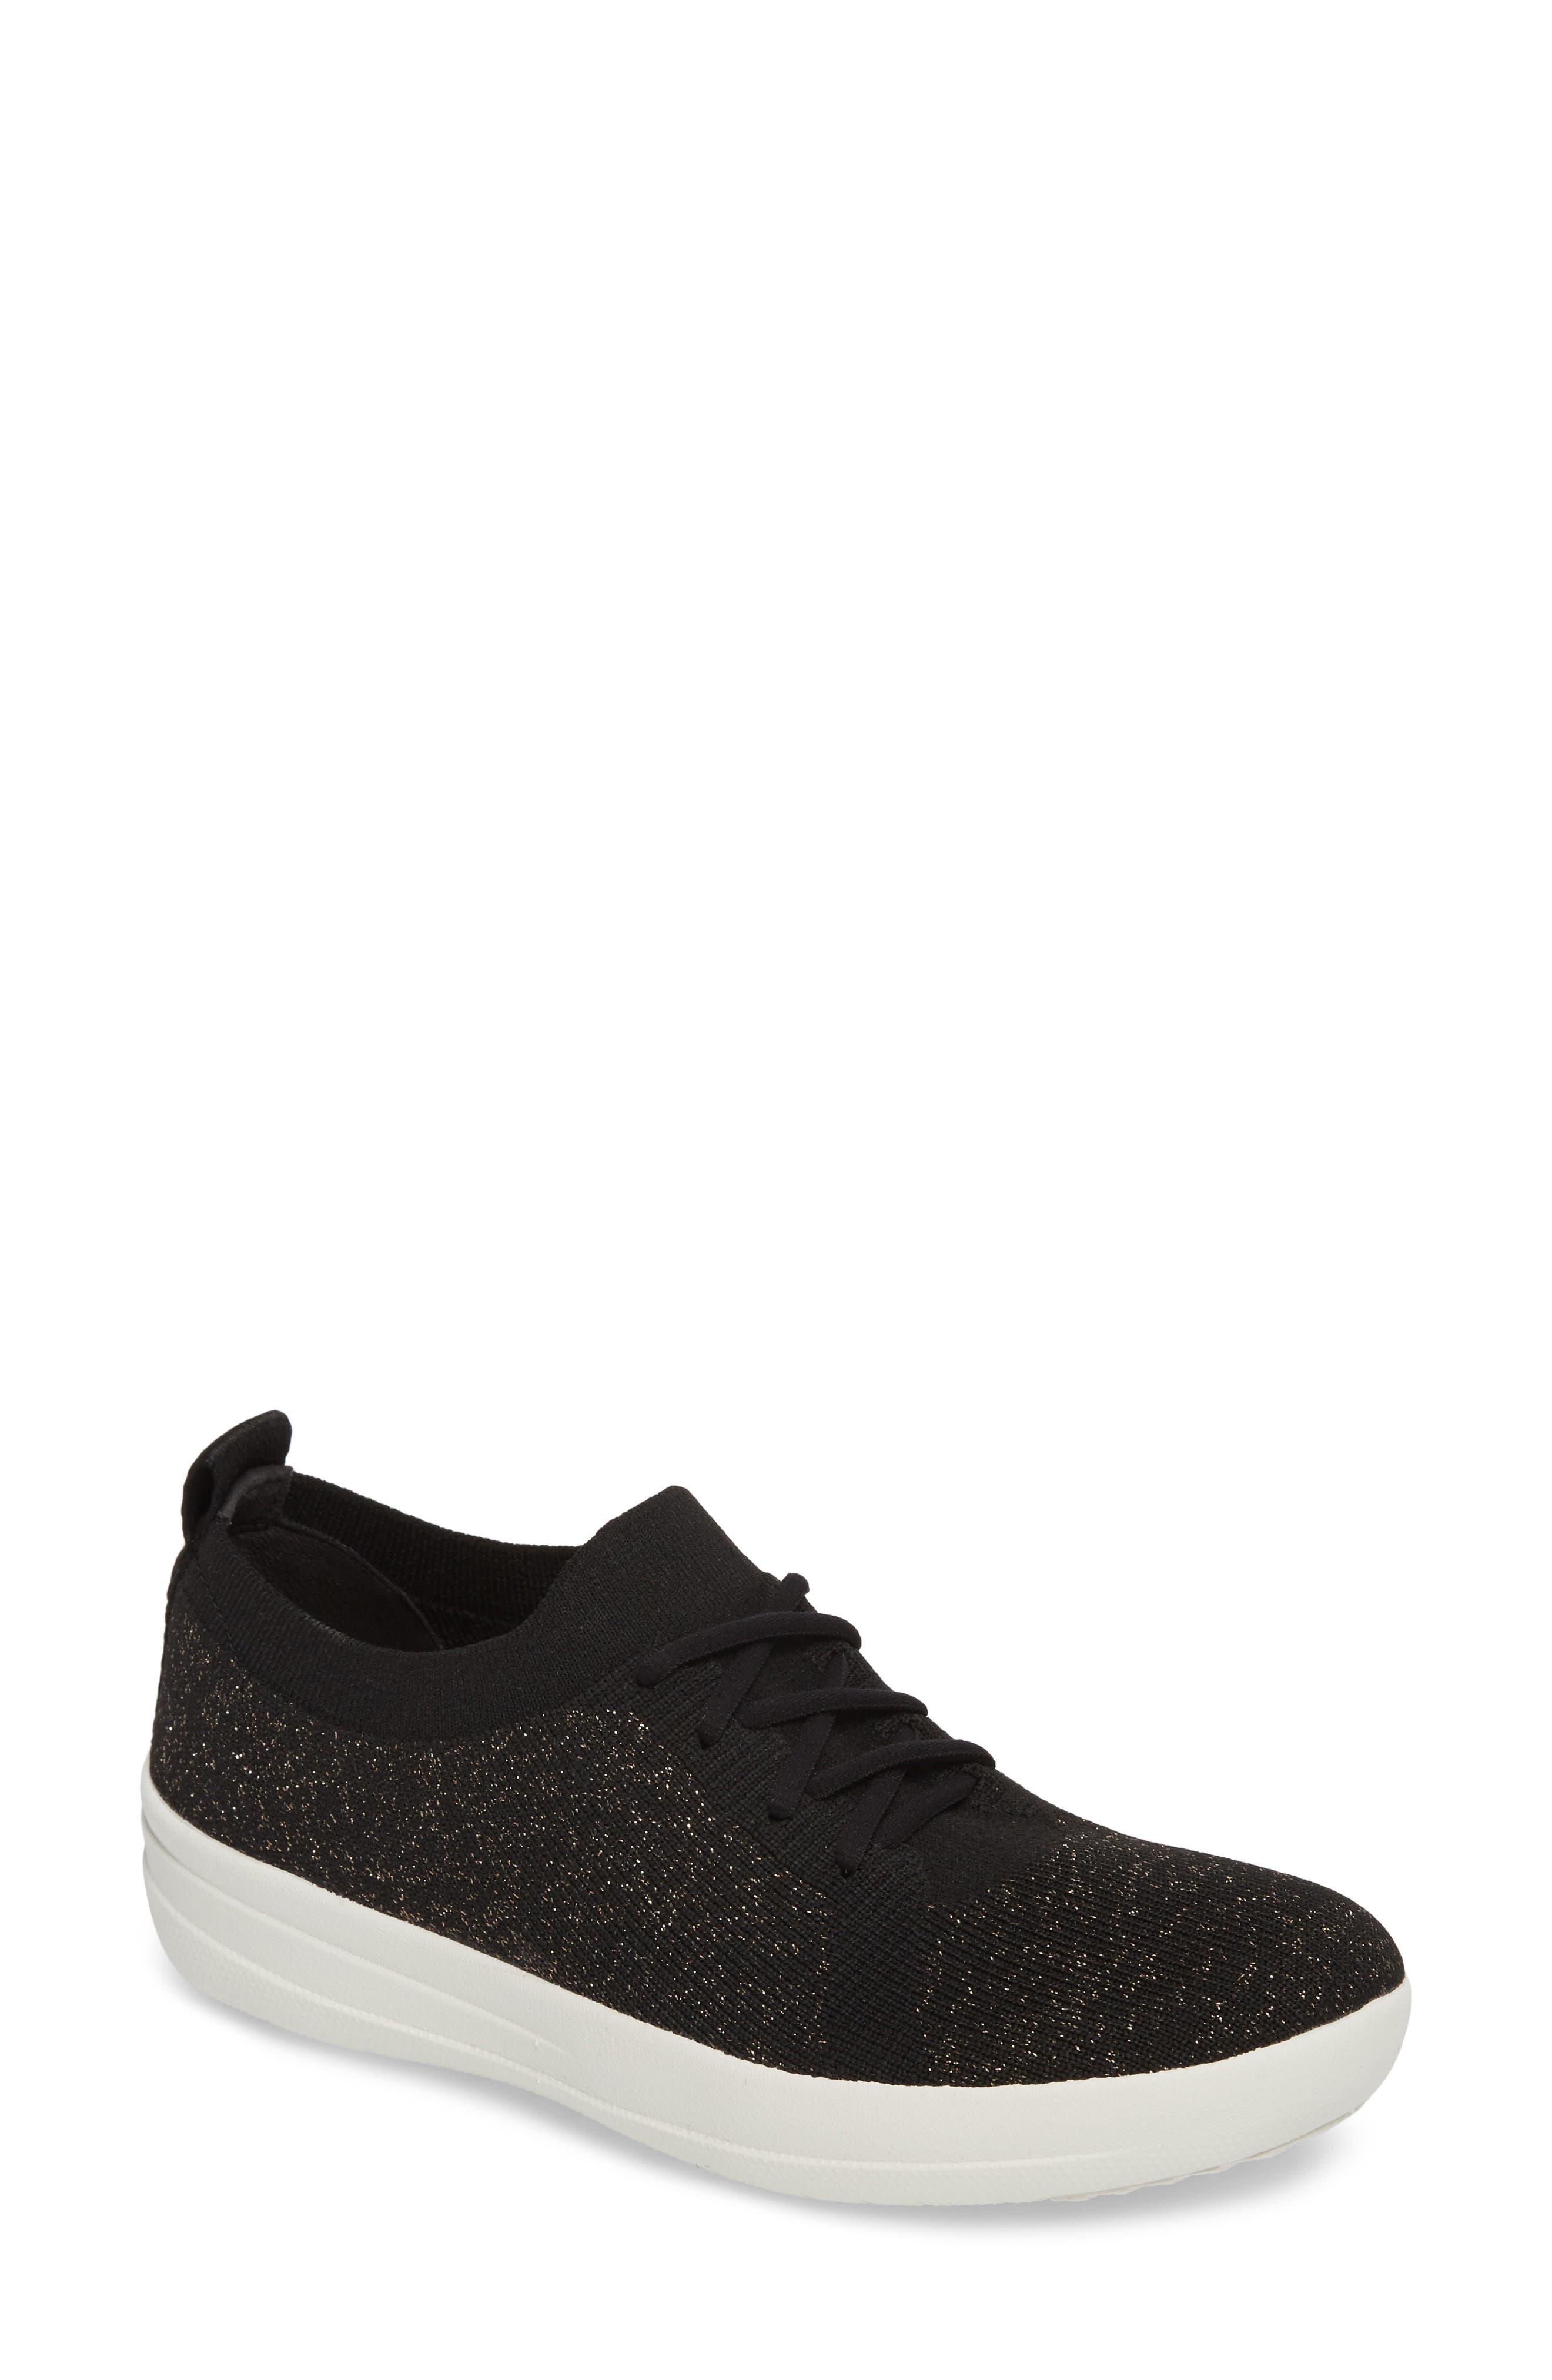 Uberknit<sup>™</sup> F-Sporty Sneaker,                             Main thumbnail 1, color,                             BLACK FABRIC